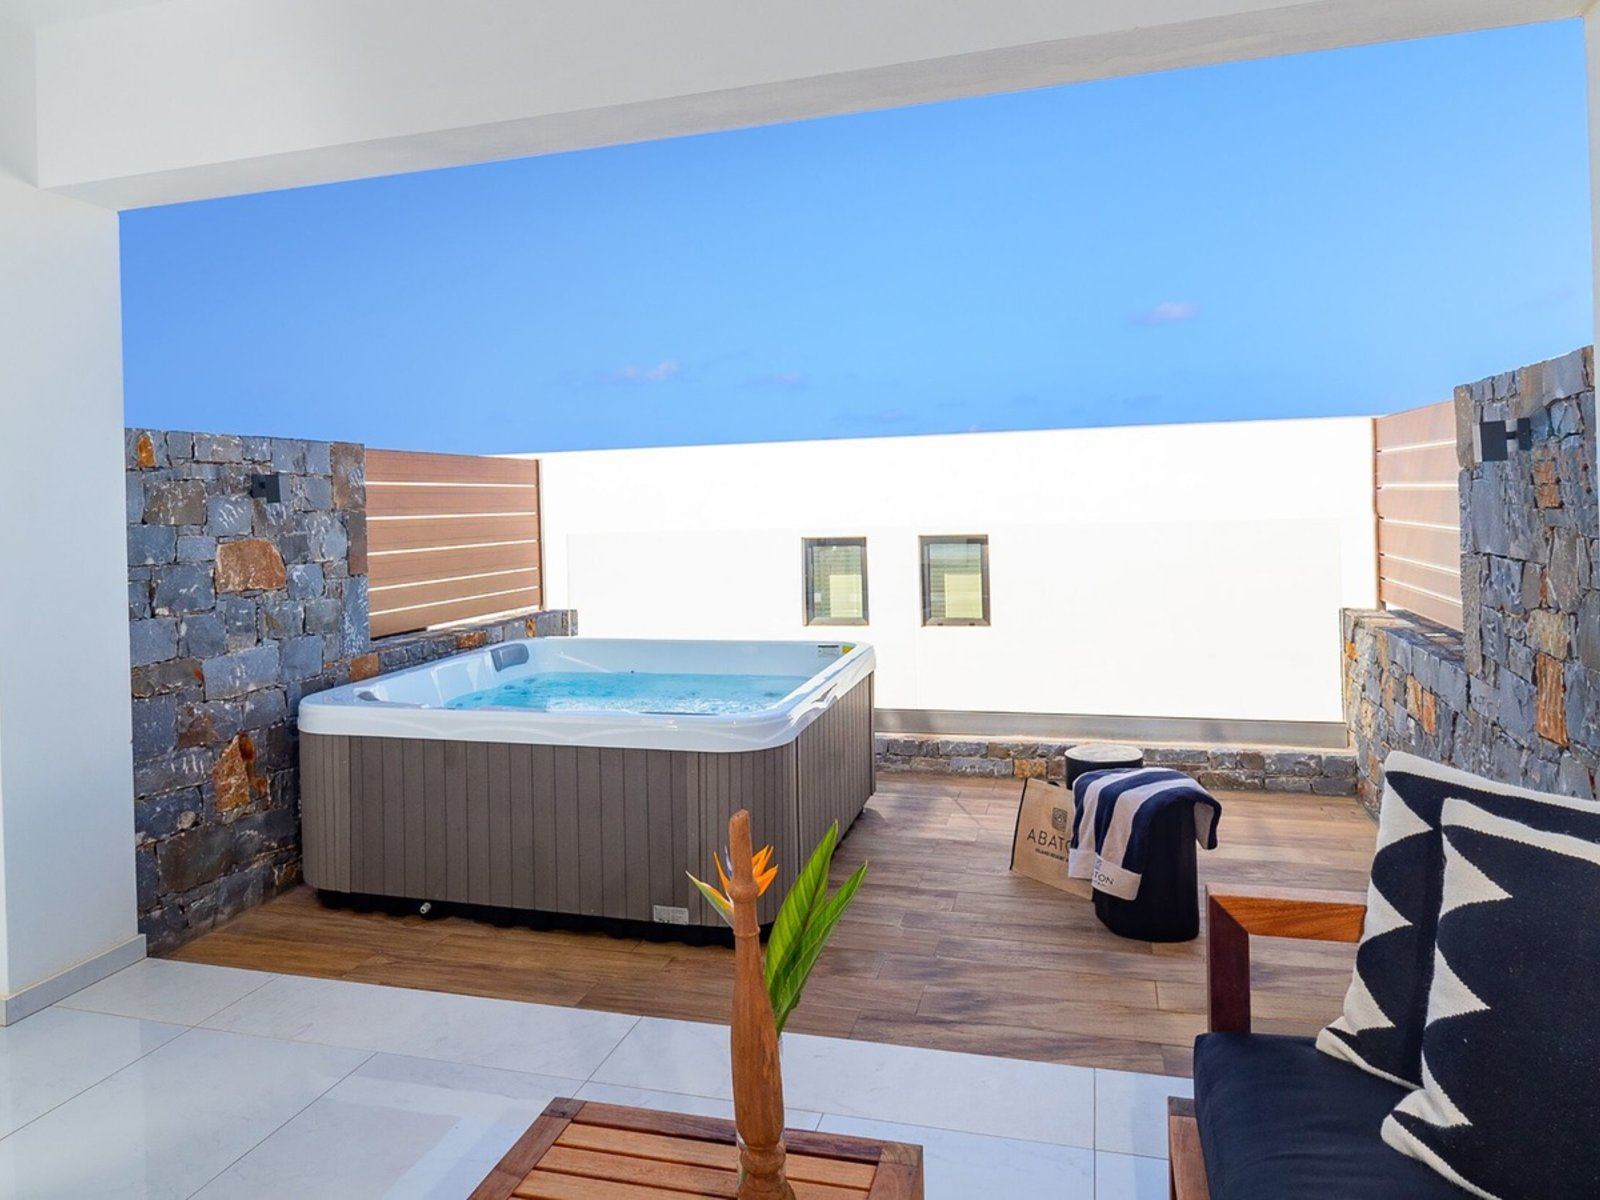 Wohnbeispiel Luxury Guestroom with Private Outdoor Jacuzzi